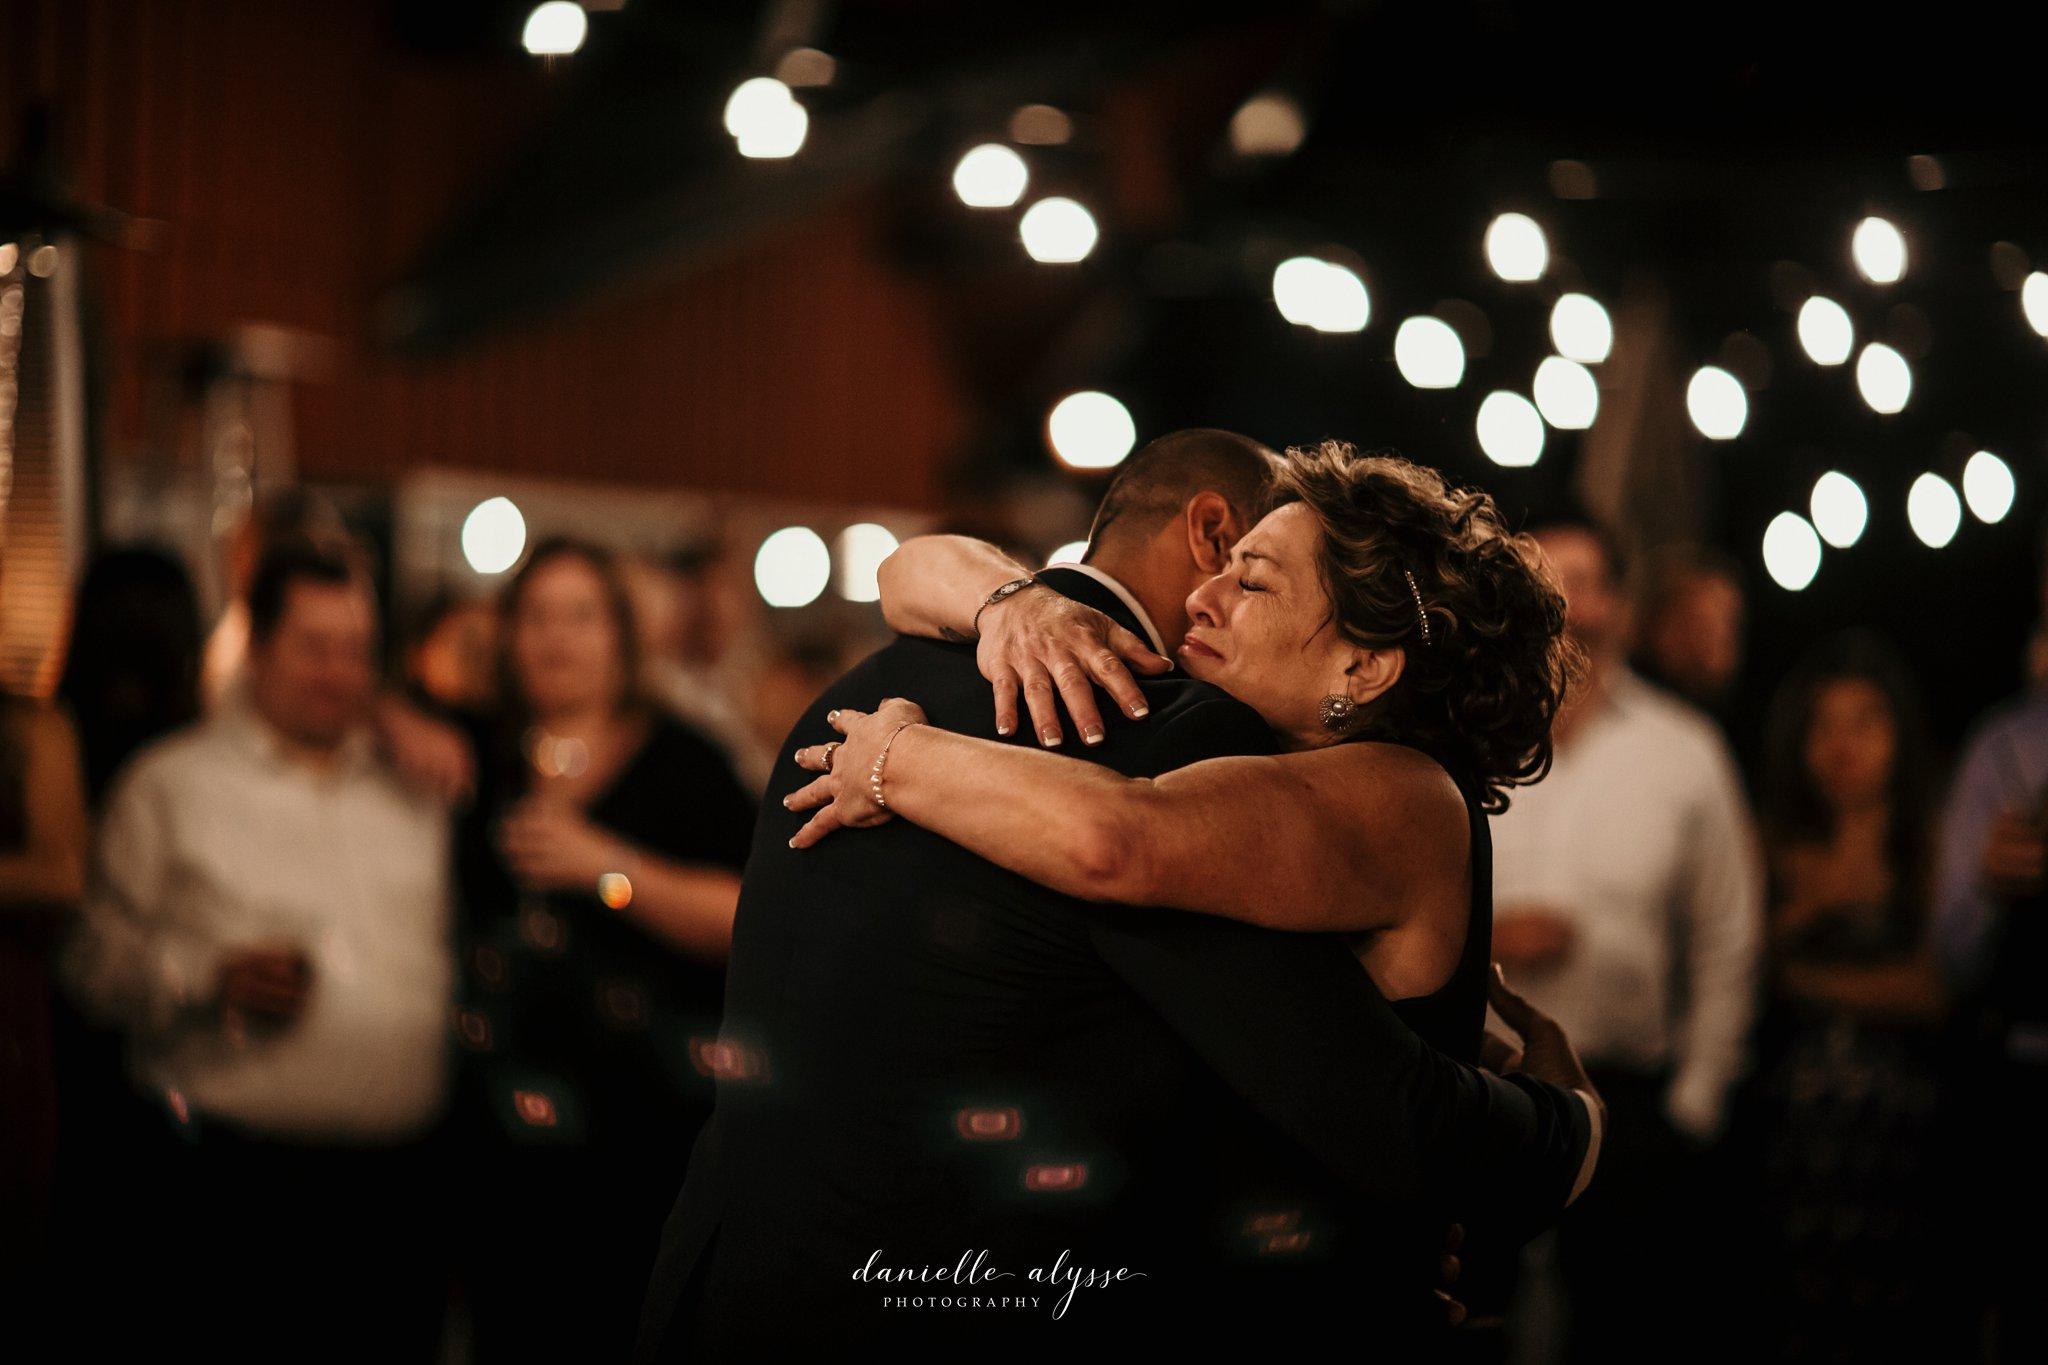 180831_wedding_stephanie_heavenly_south_lake_tahoe_danielle_alysse_photography_destination_blog_1195_WEB.jpg